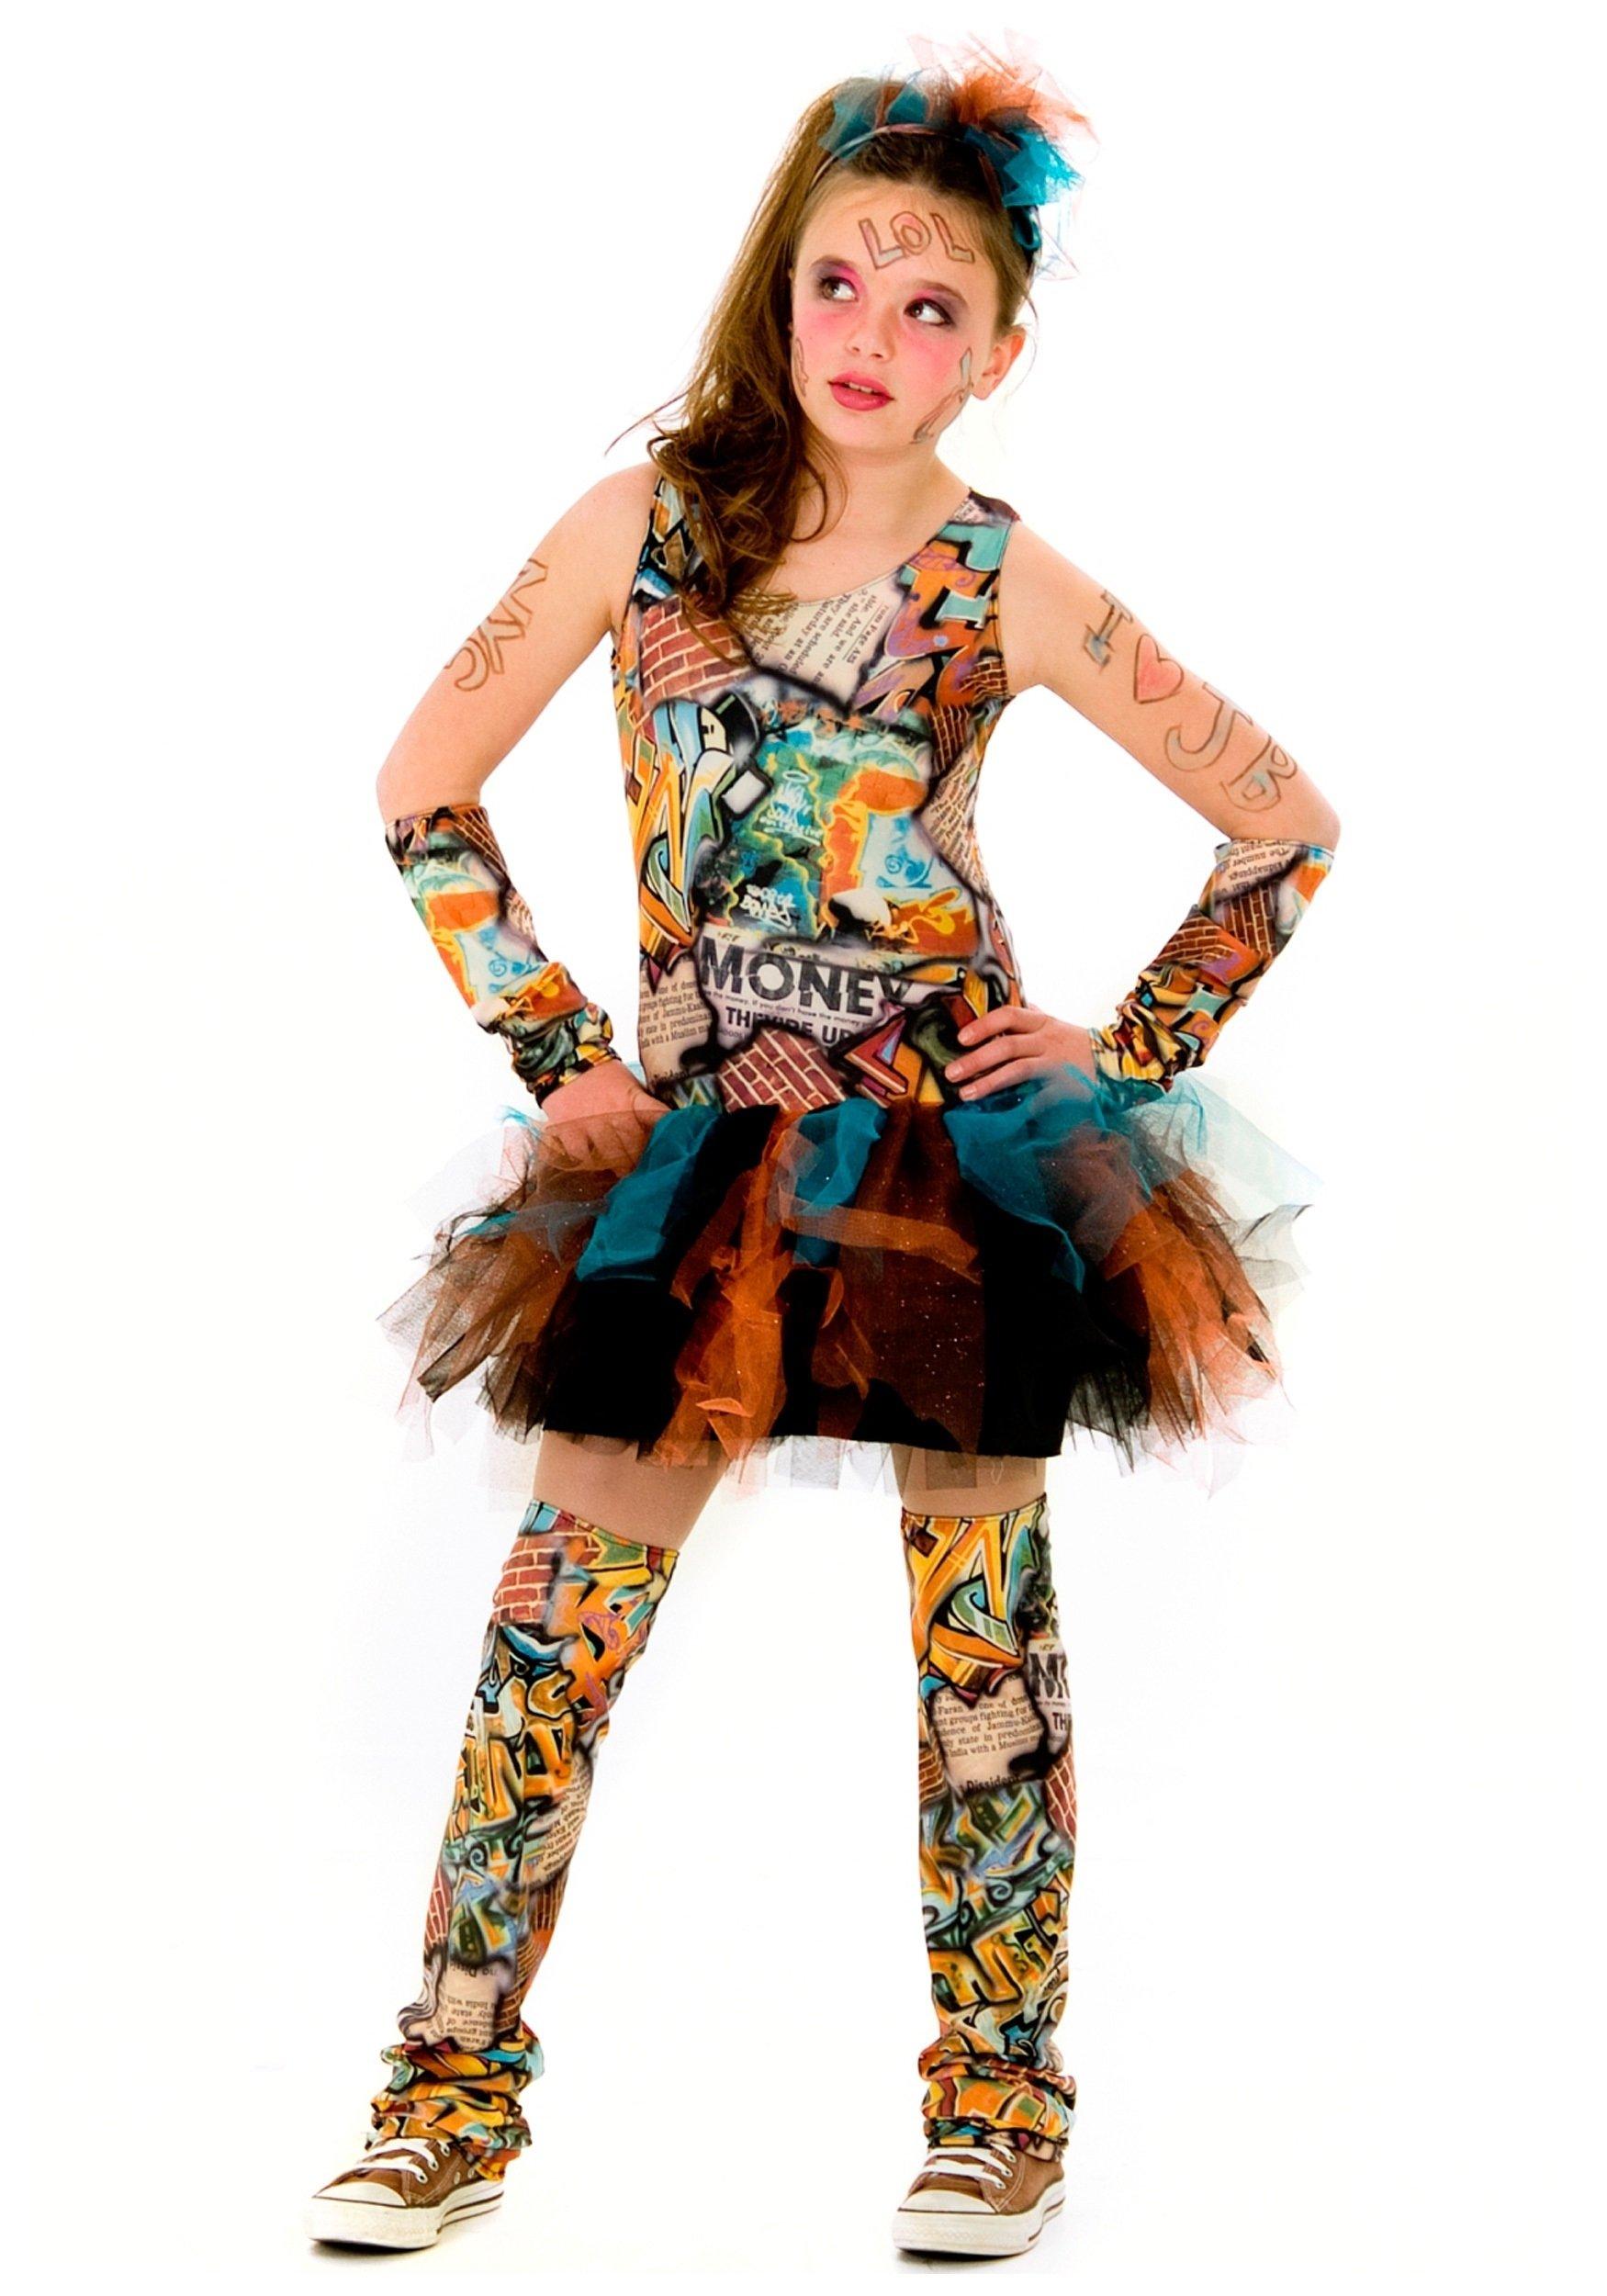 10 Unique Tween Girl Halloween Costume Ideas tween graffiti girl costume unique and colorful teen costumes  sc 1 st  Unique Ideas 2018 & 10 Unique Tween Girl Halloween Costume Ideas